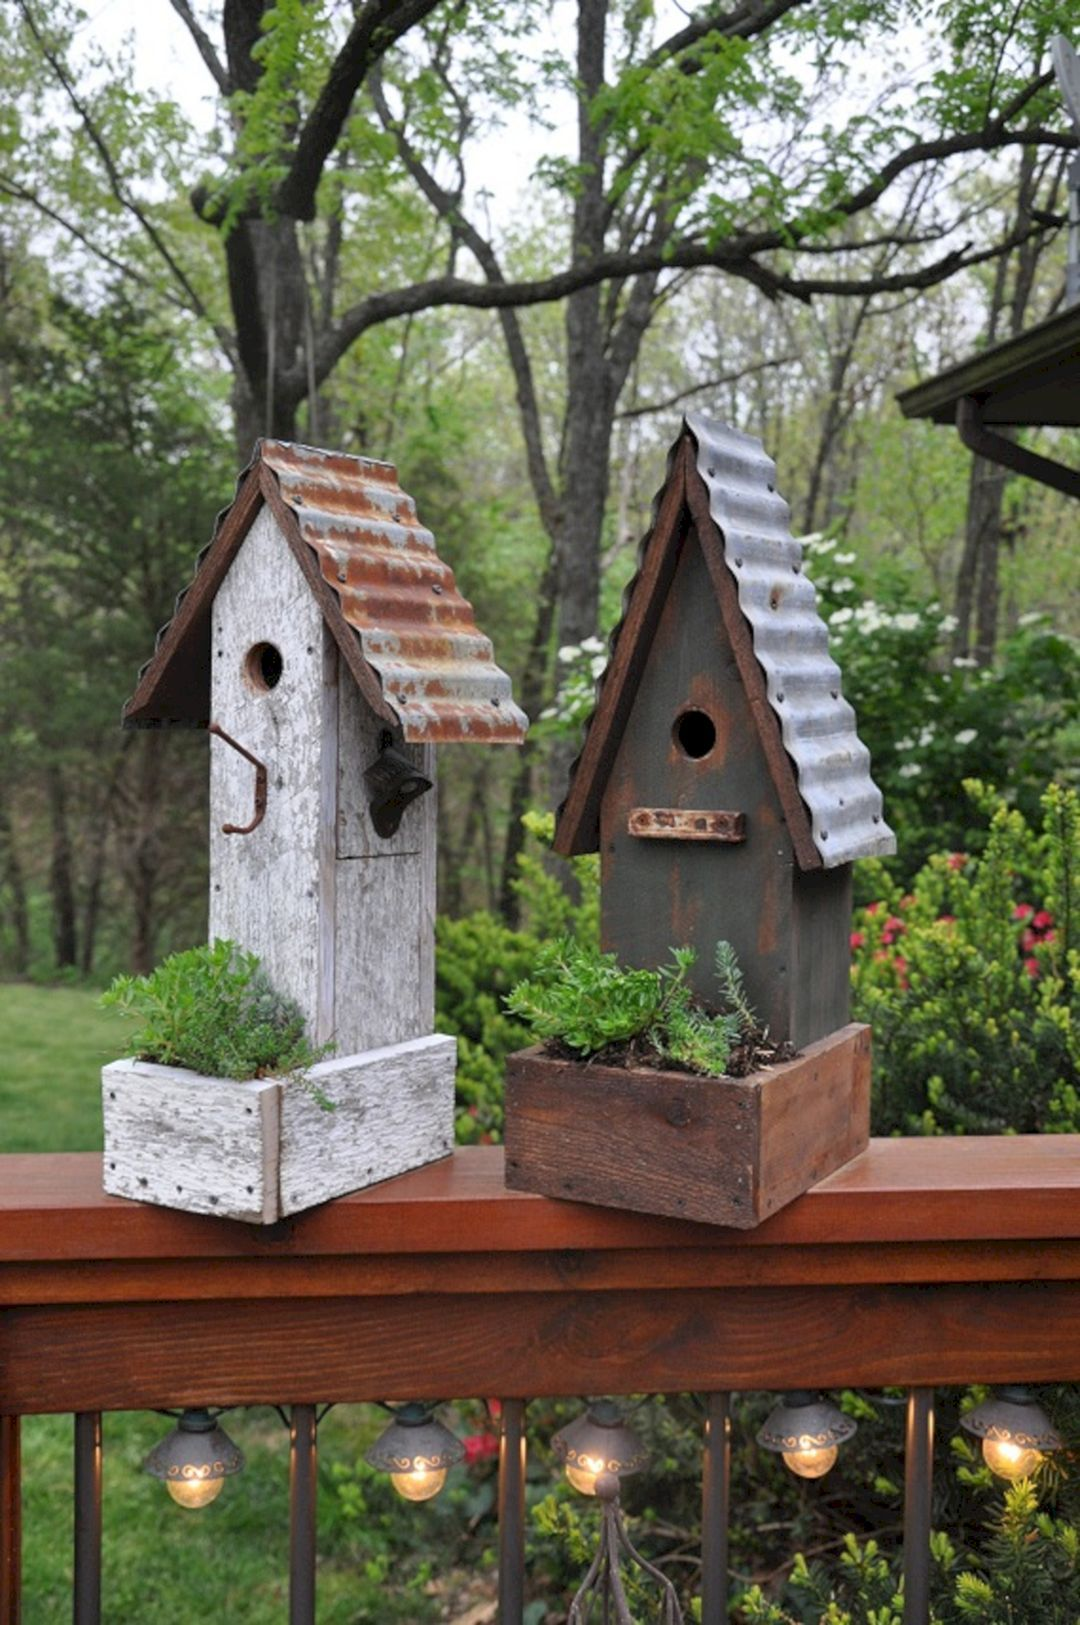 32 Incredible Birdhouse Ideas To Make Your